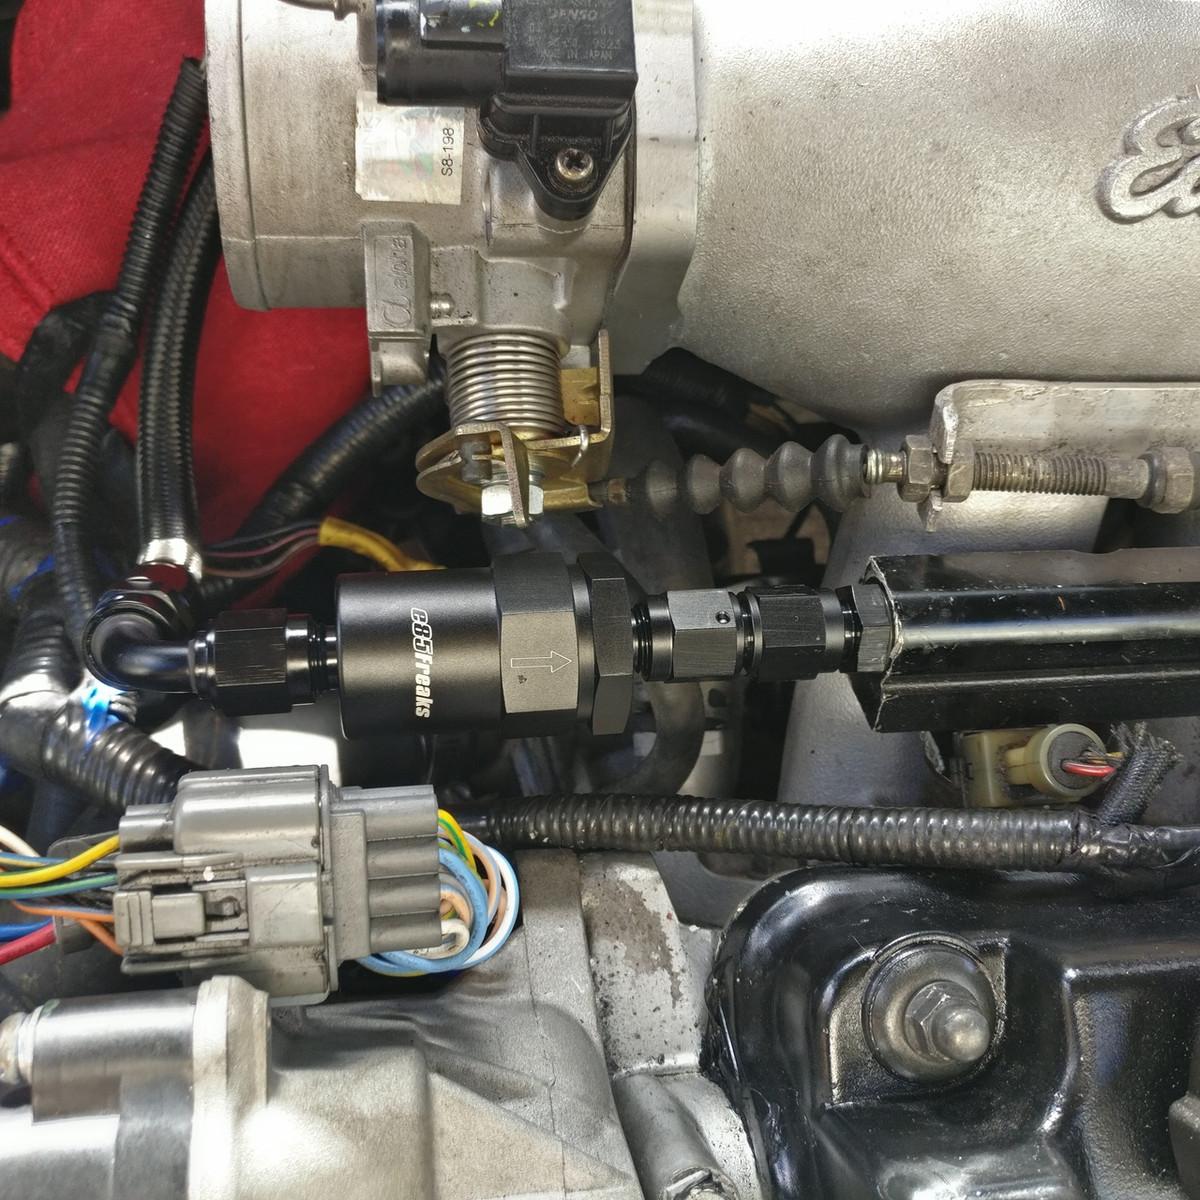 jbtuned honda ef civic da integra crx fuel line tuck kithonda crx fuel filter 3 [ 1200 x 1200 Pixel ]